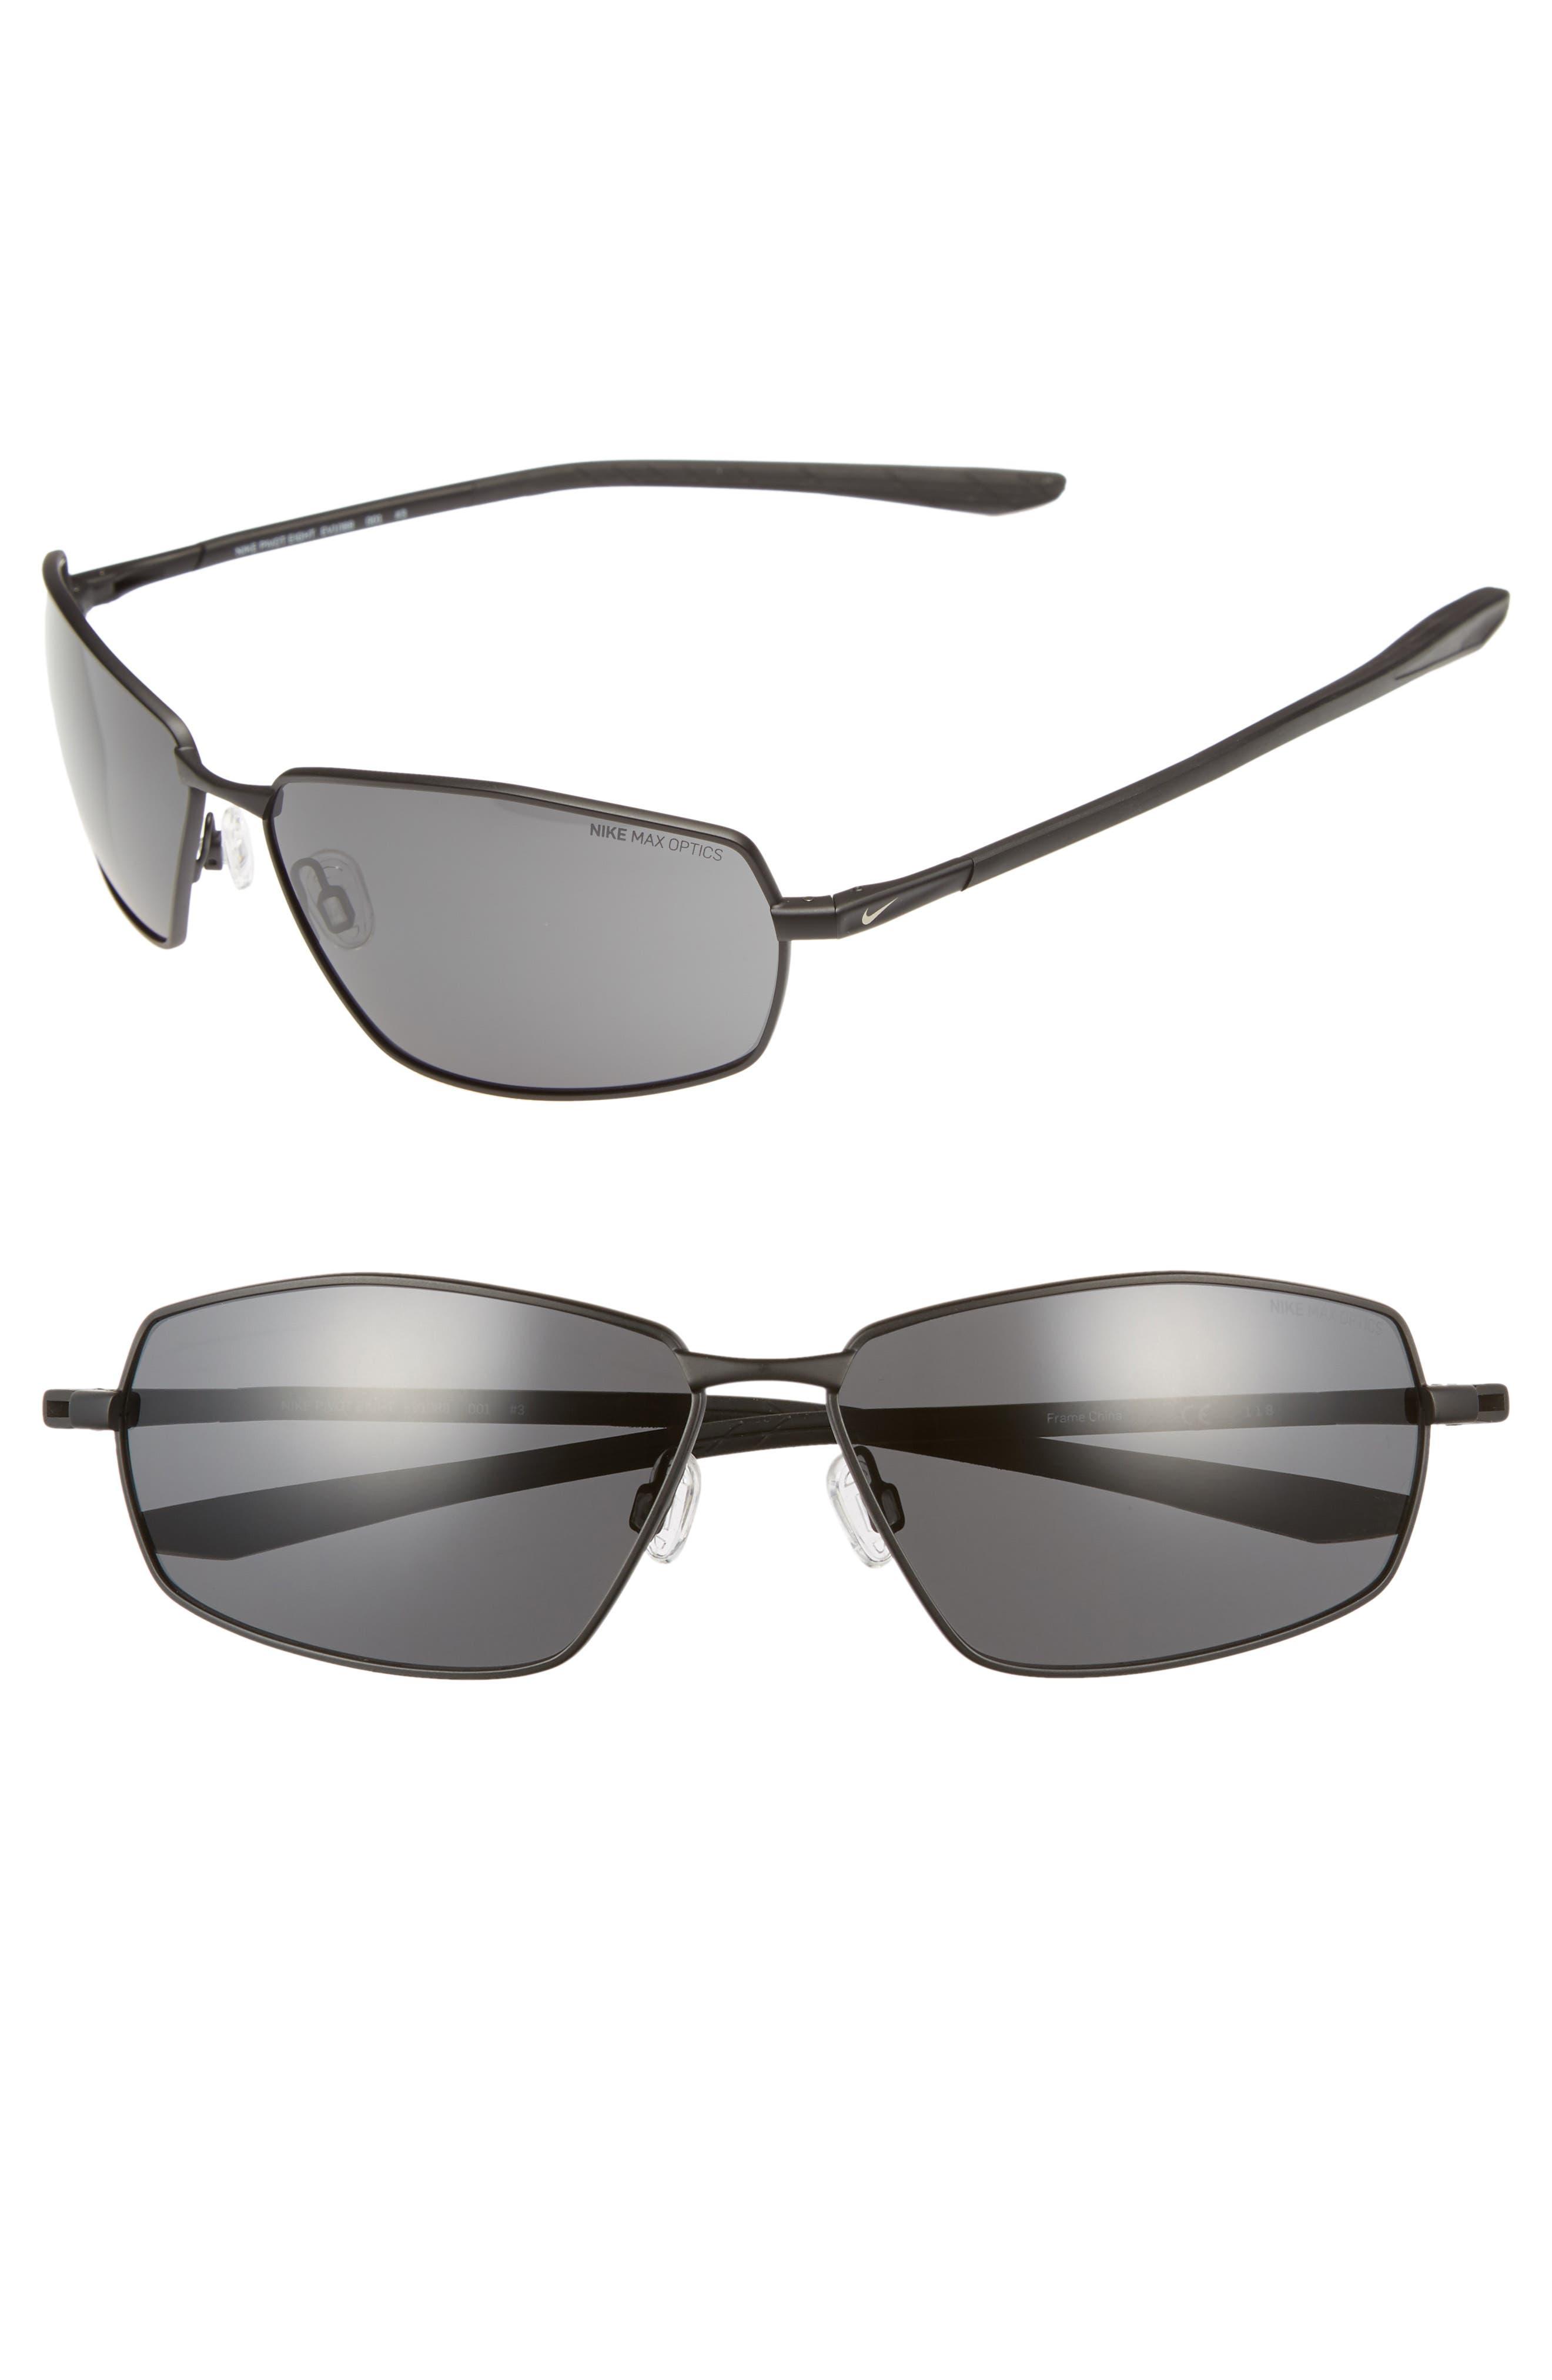 Pivot Eight 63mm Oversize Sunglasses,                             Main thumbnail 1, color,                             Satin Black/ Dark Grey